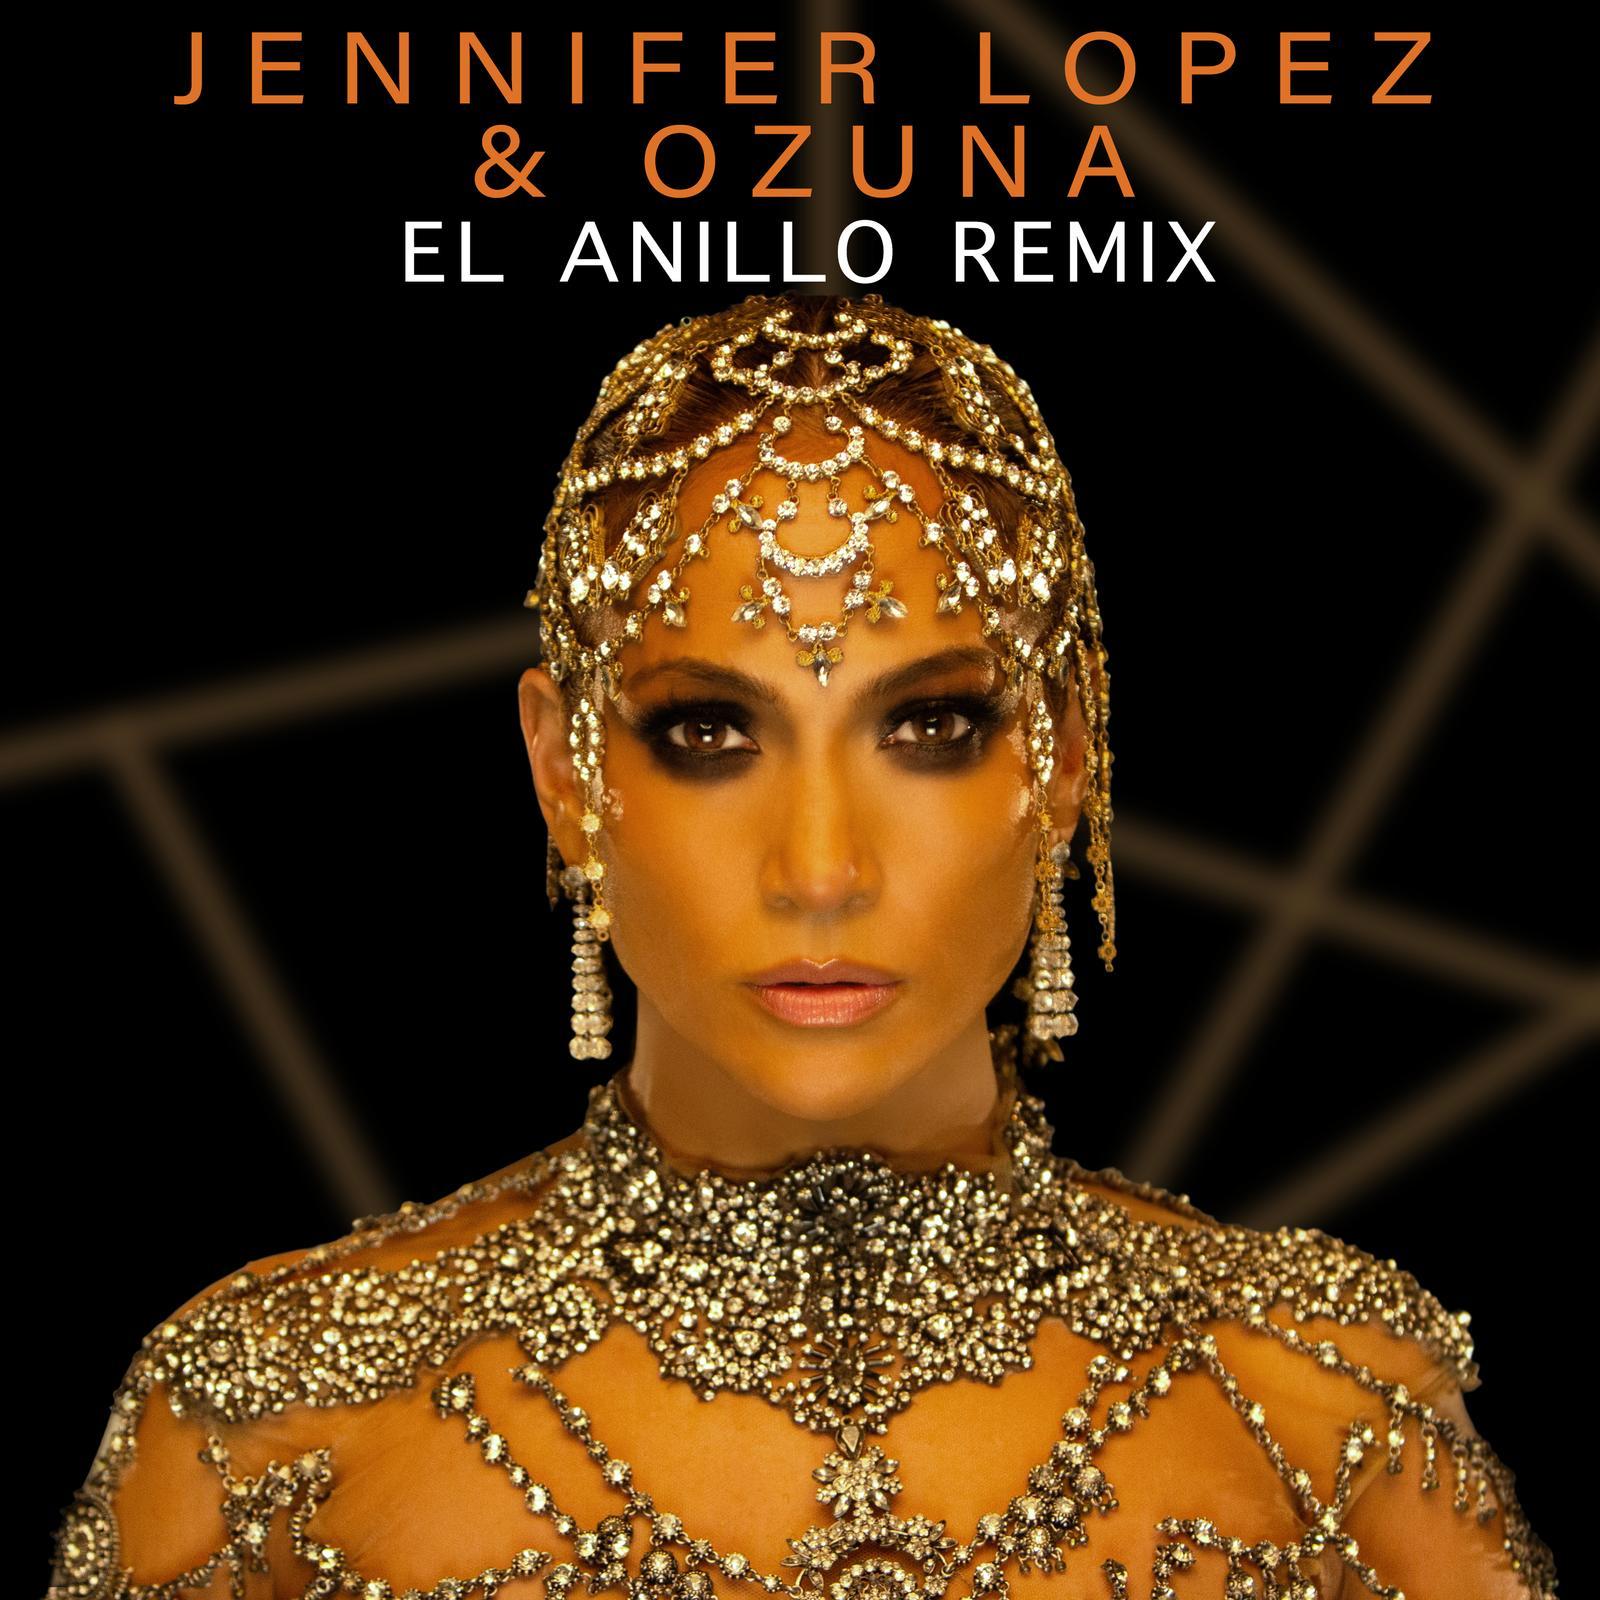 El anillo (Remix)